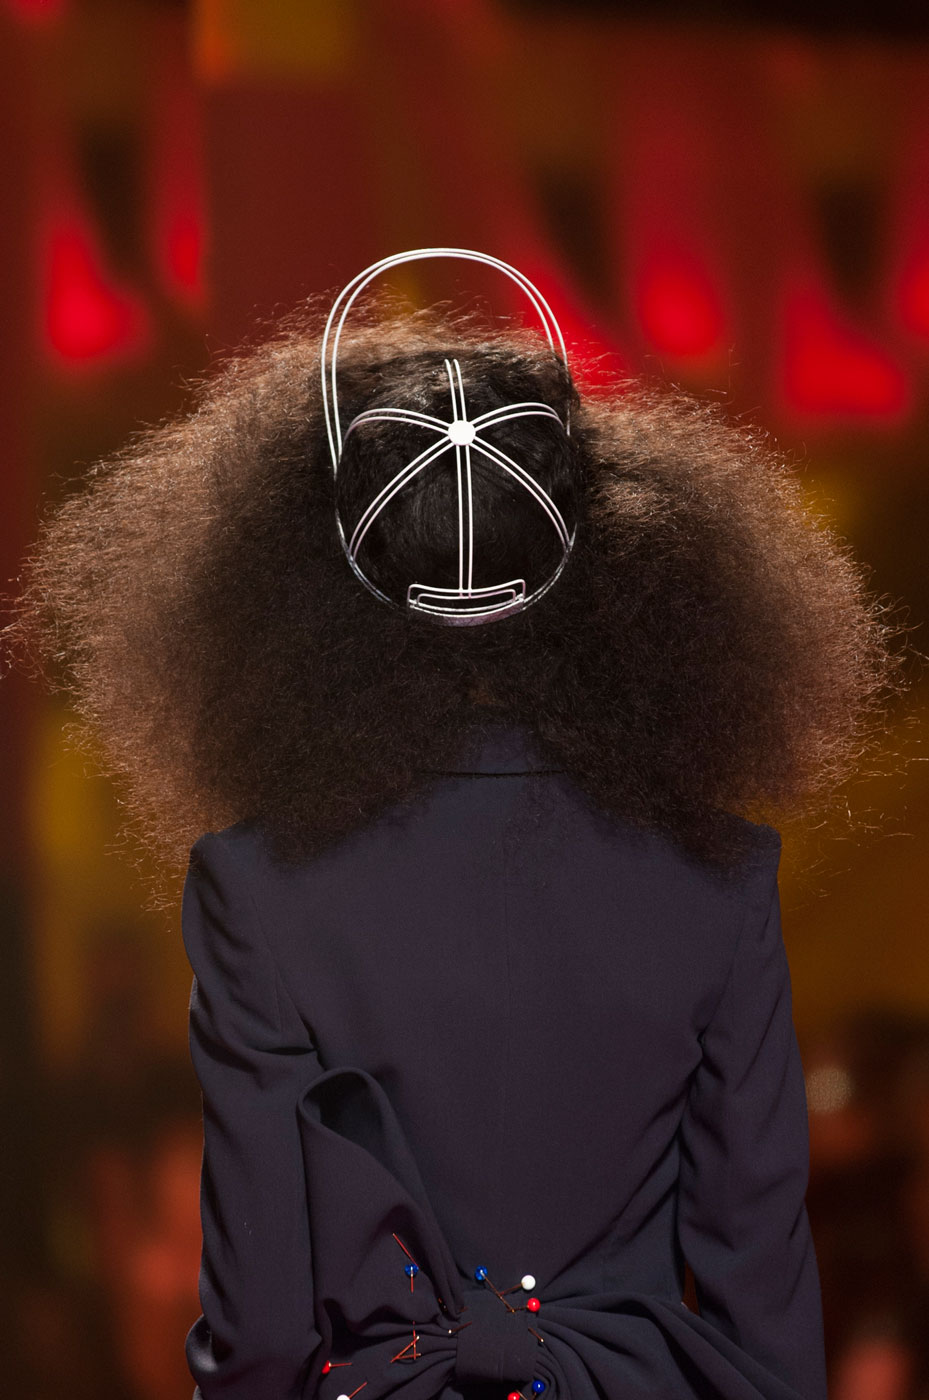 Schiaparelli-fashion-runway-show-close-ups-haute-couture-paris-spring-summer-2015-the-impression-18